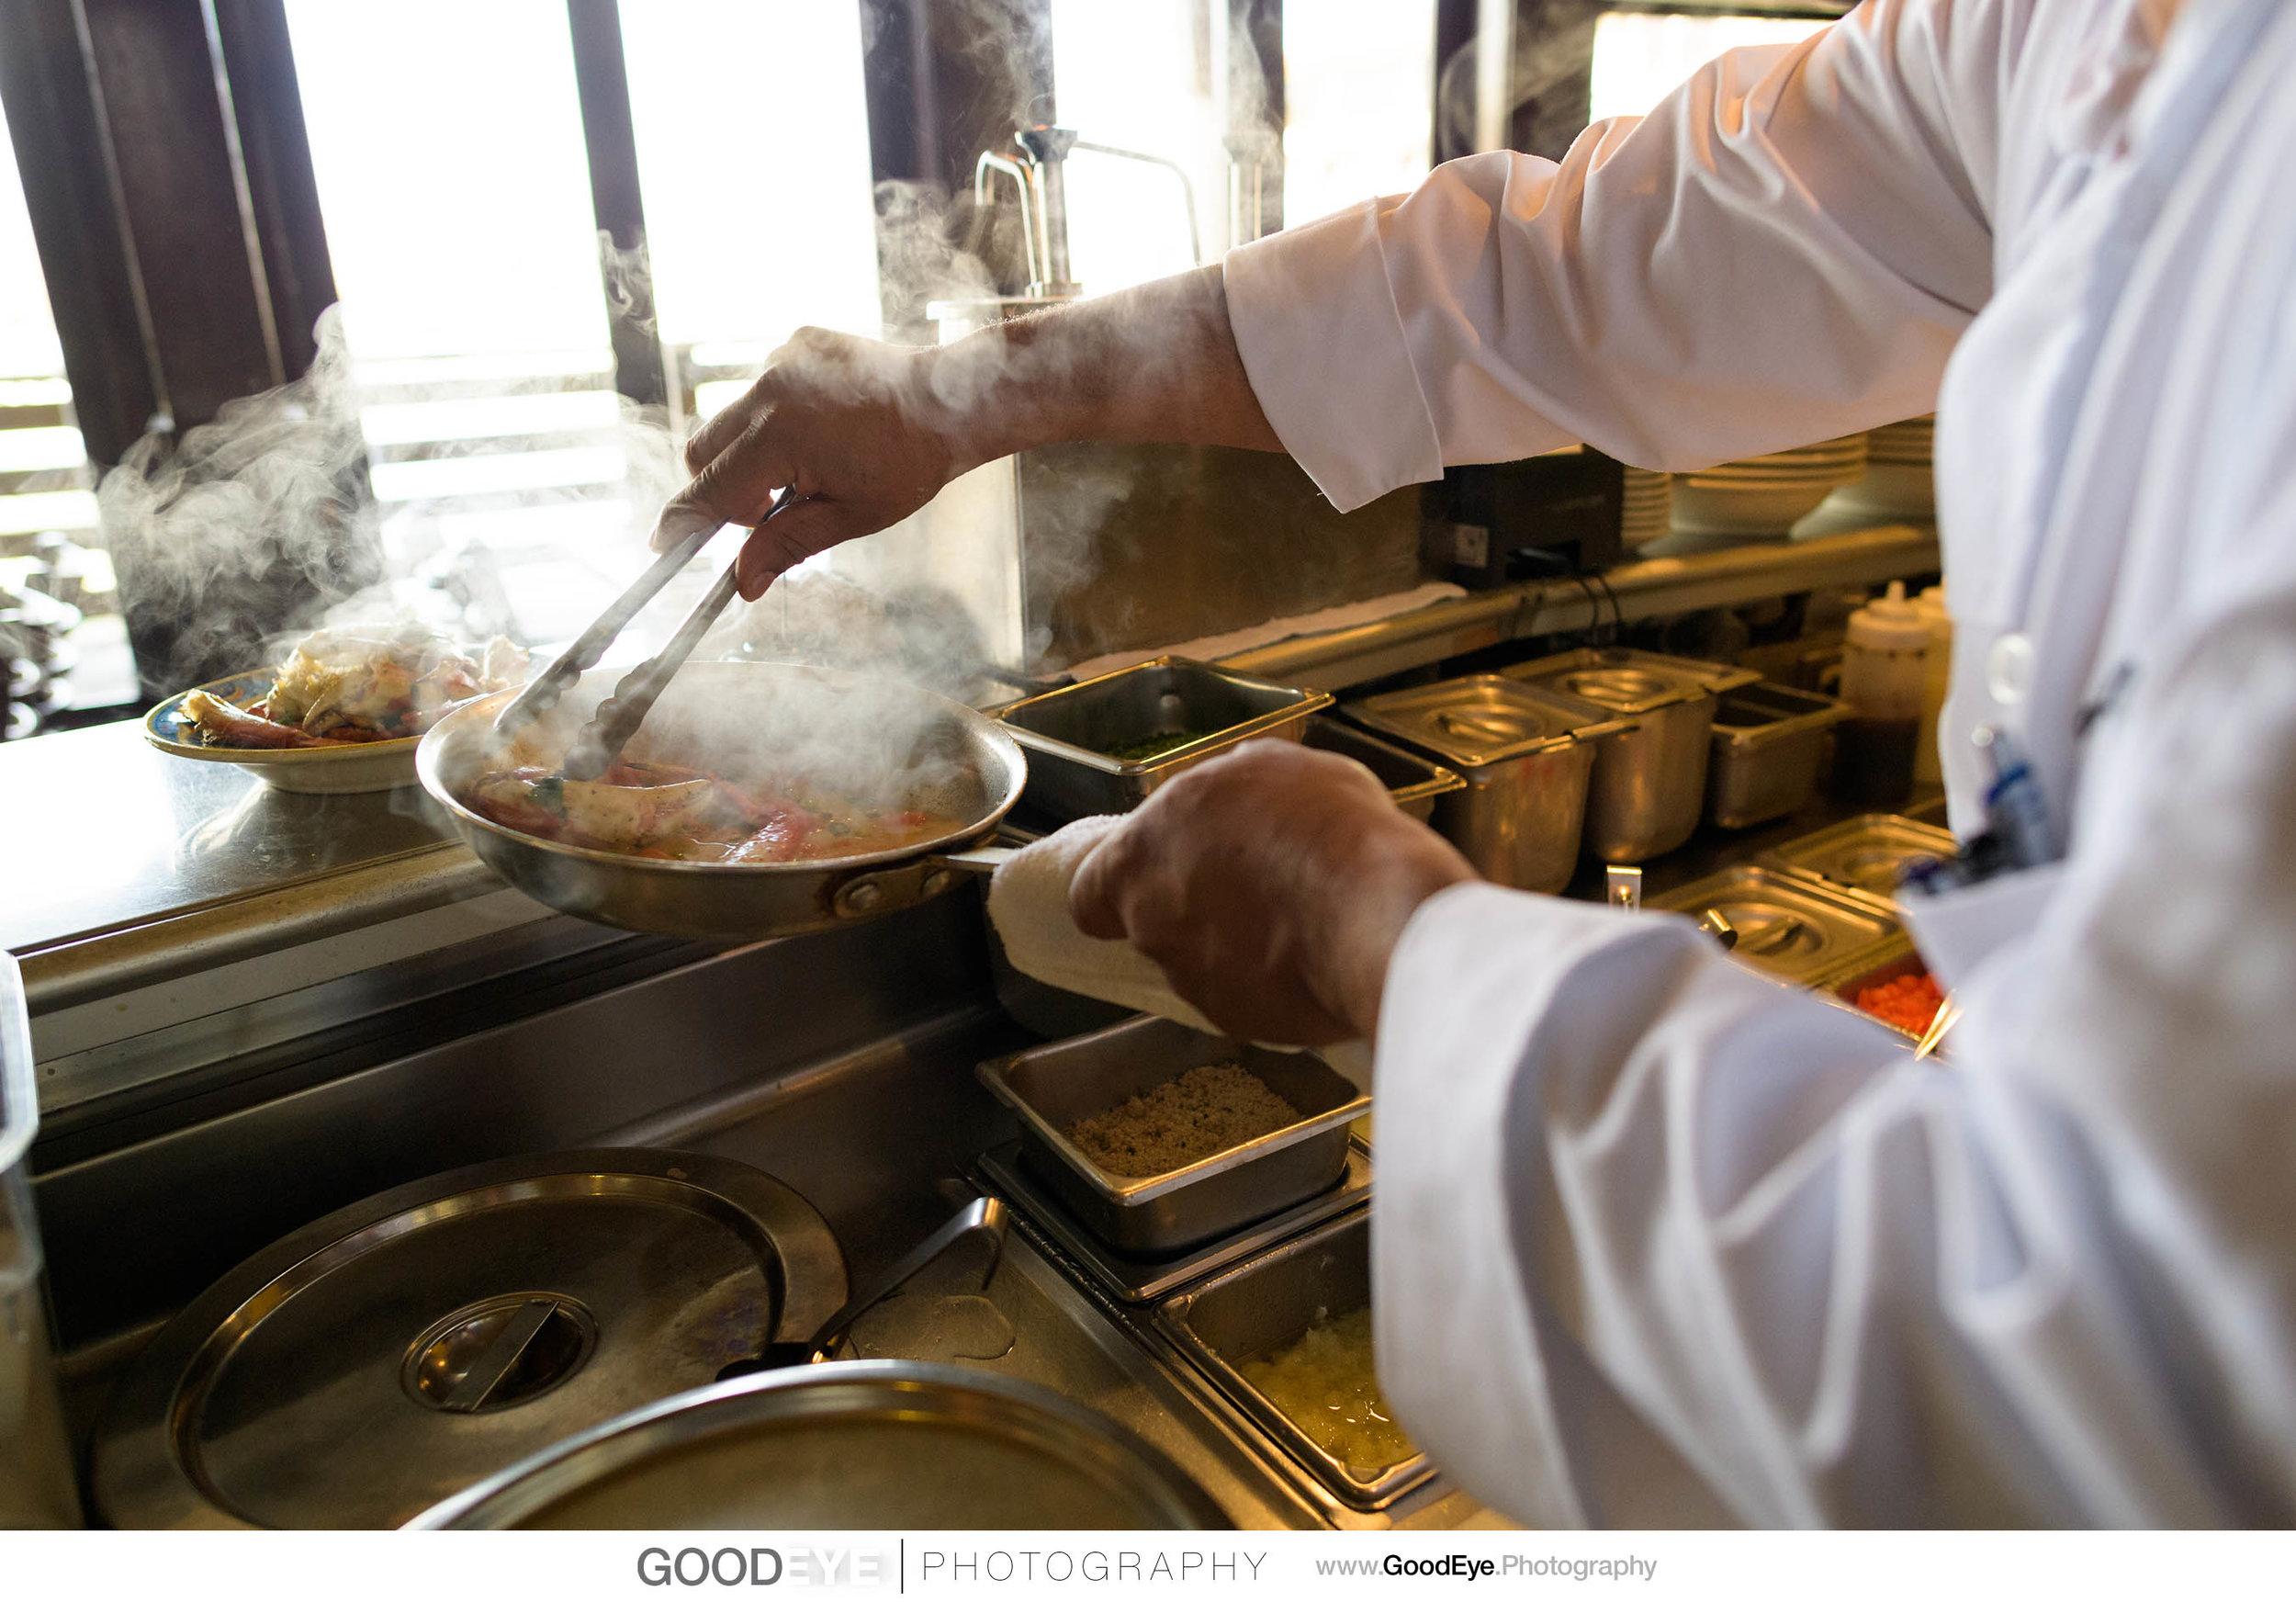 4764_Cafe_8_Aliotos_San_Francisco_Food_Photography_web.jpg